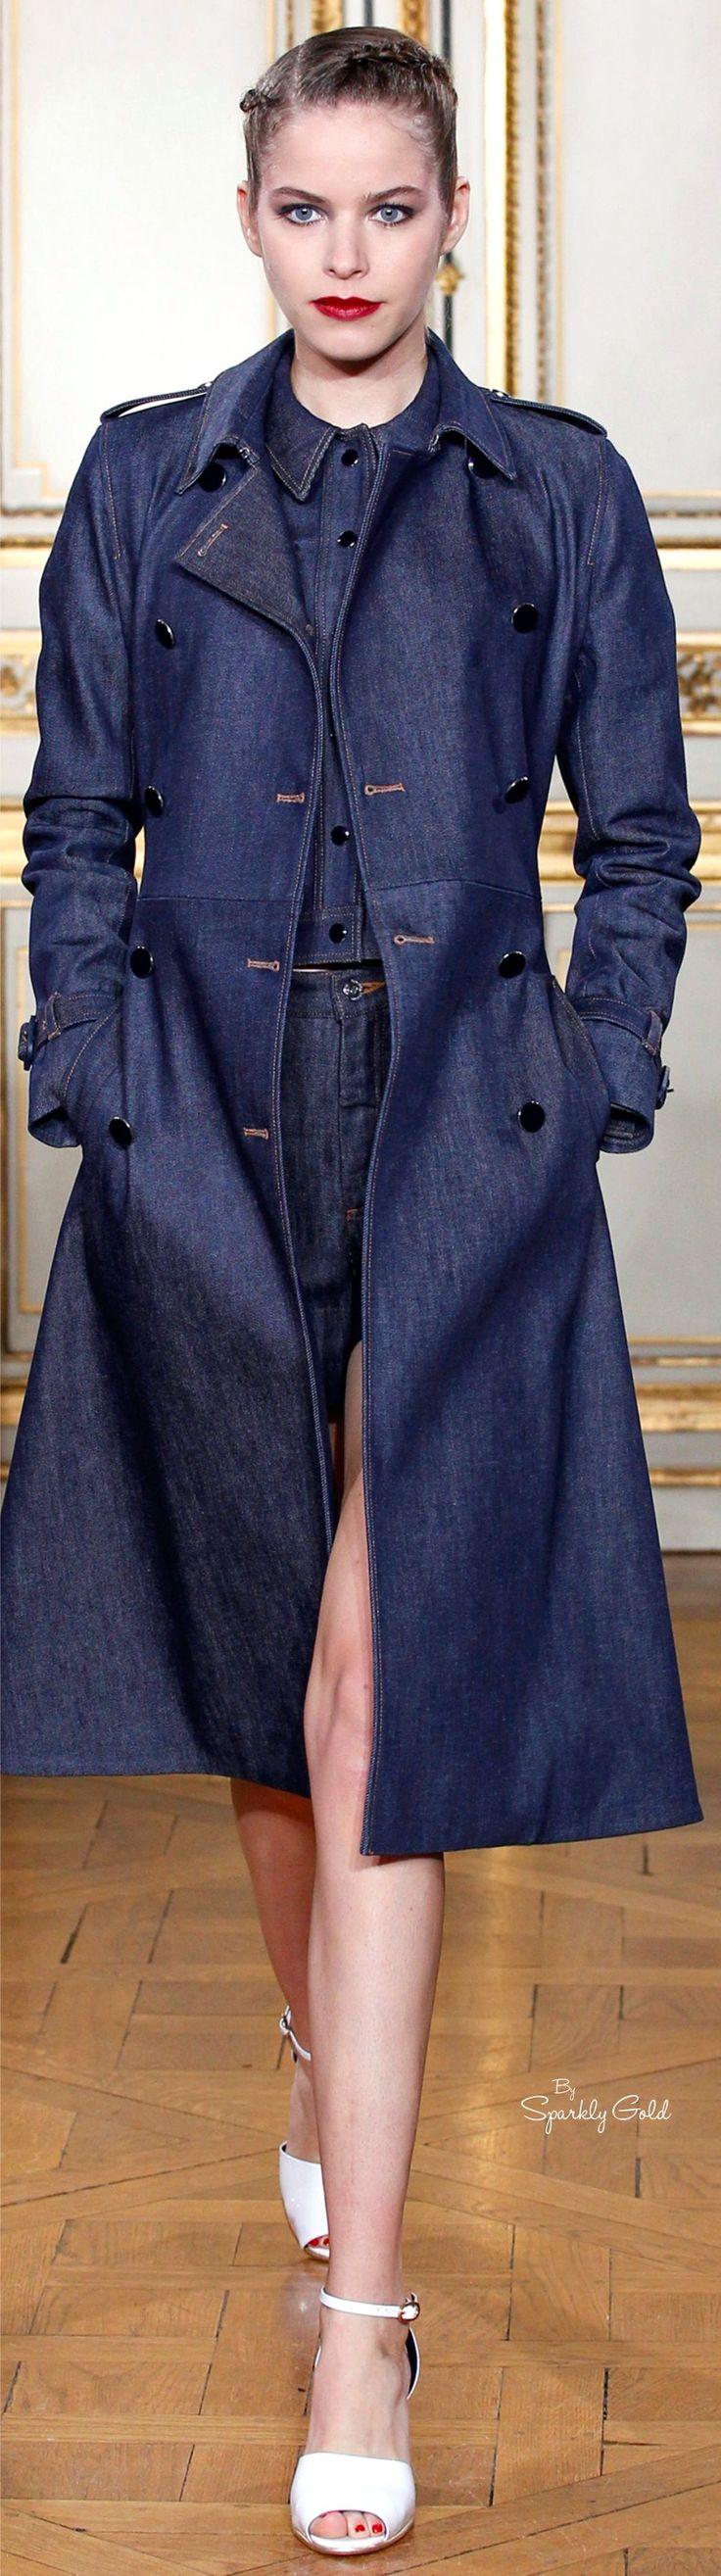 <Vanessa Seward Spring 2016> Dark color denim trench coat. Selvedge denim was popular for 2015.